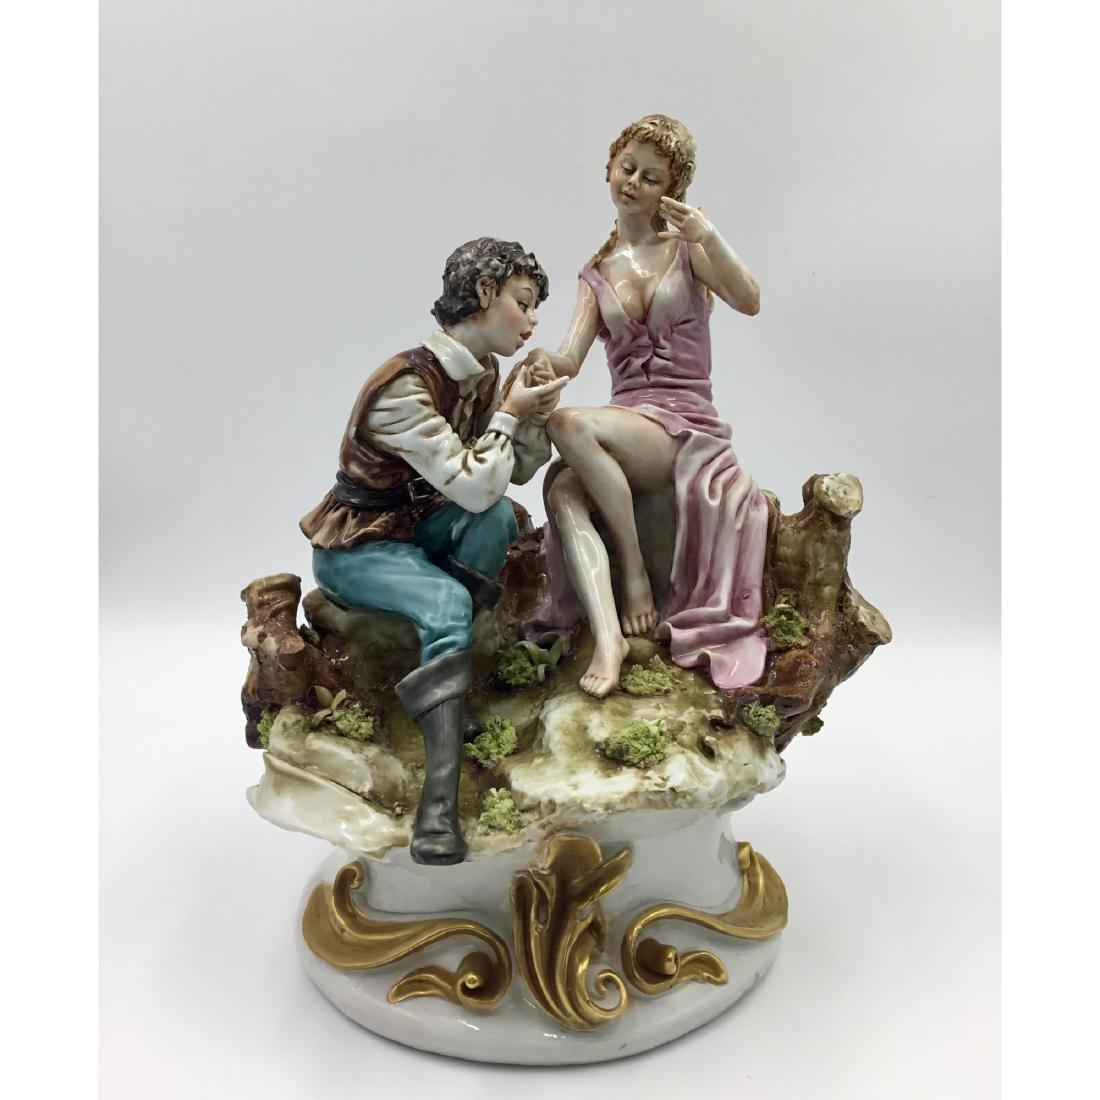 CAPODIMONTE LARGE PORCELAIN MAN & WOMAN FIGURINE